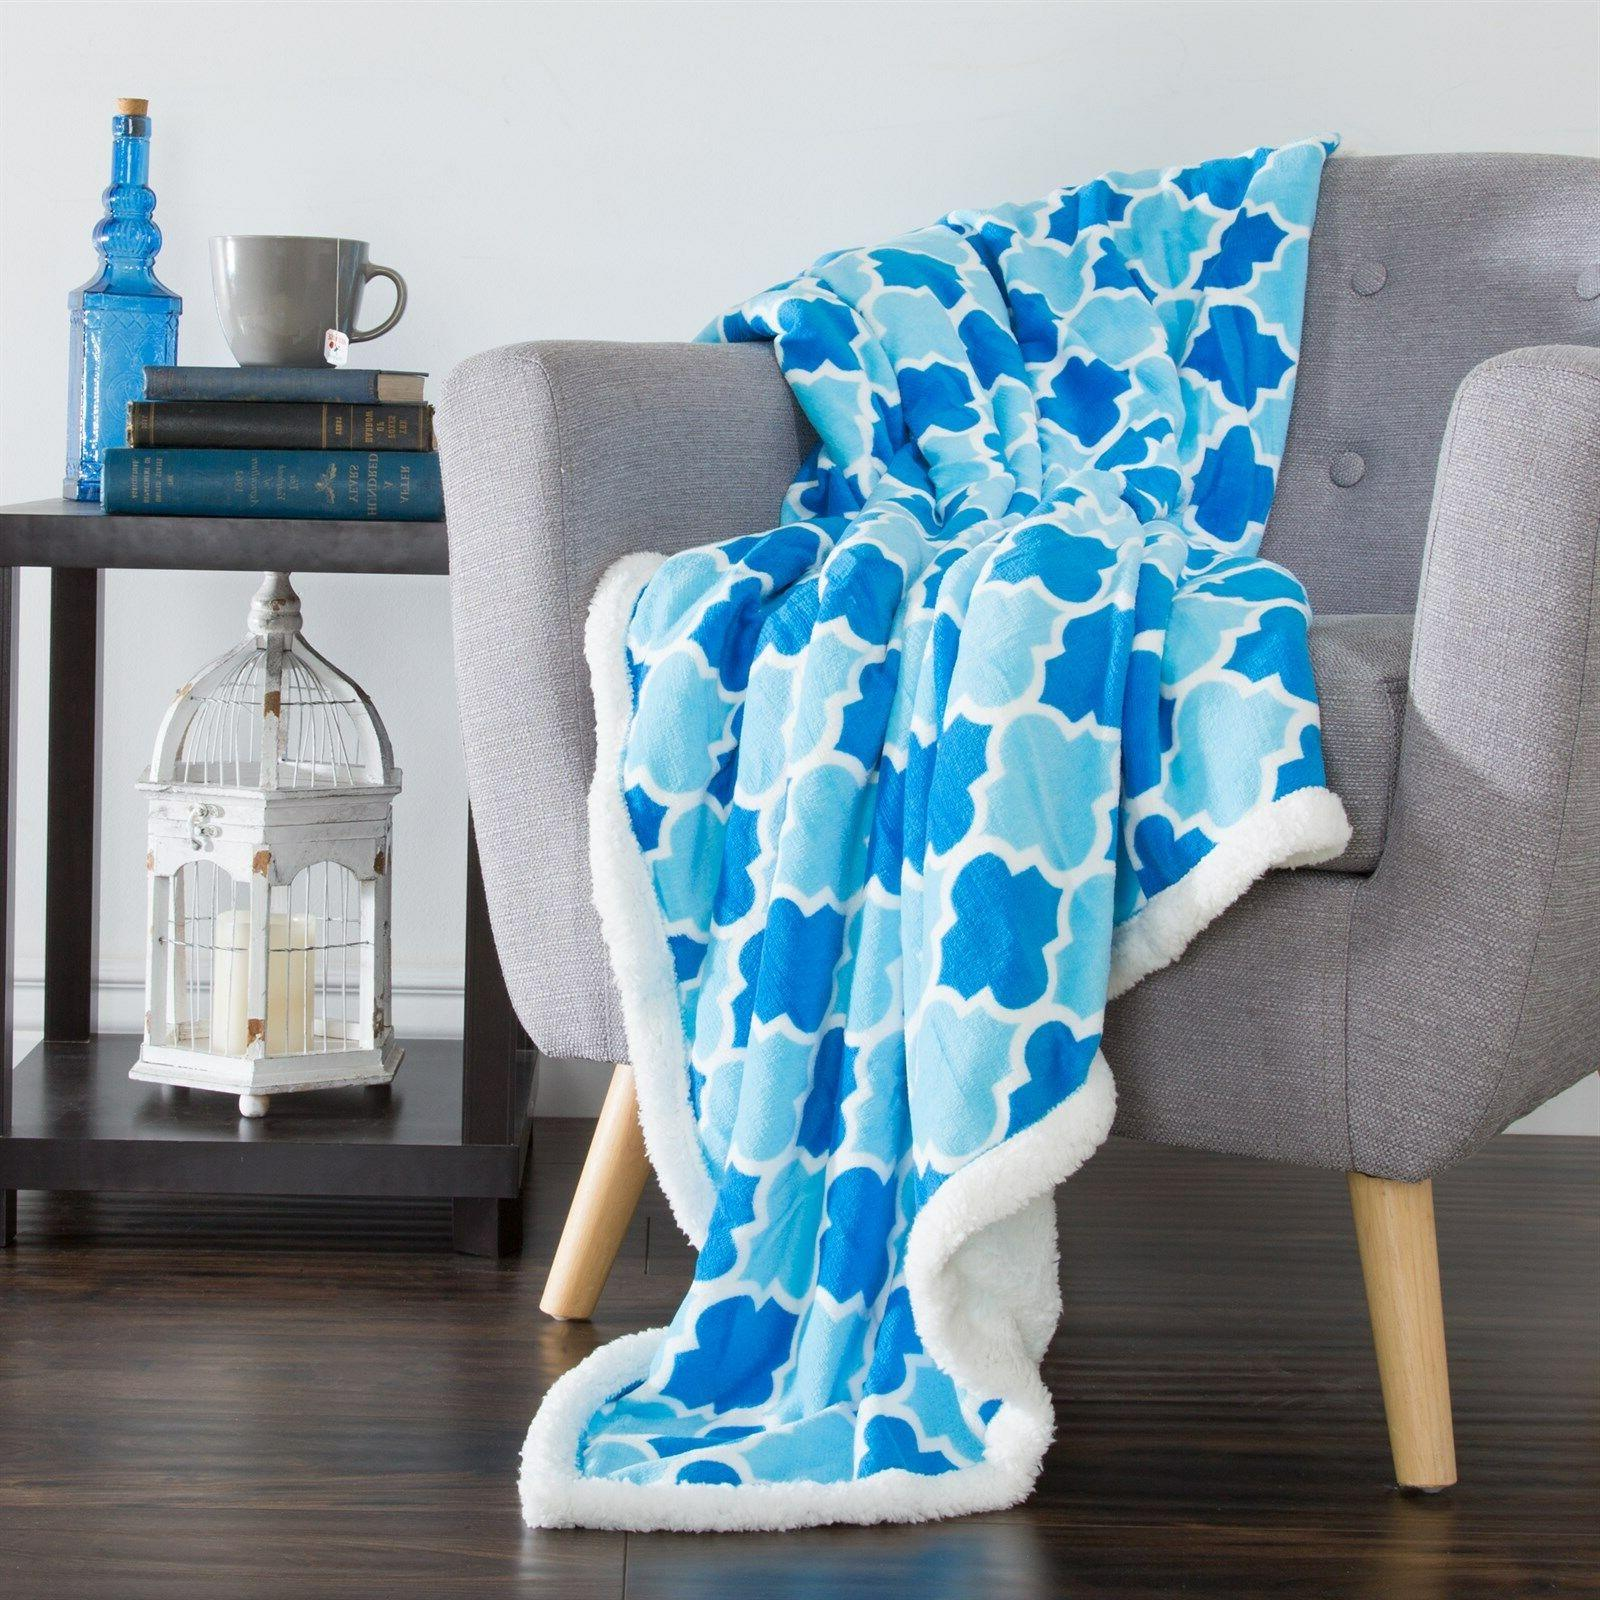 Lavish Home Fleece Sherpa Blue Colors Throw Blanket 50 x 60